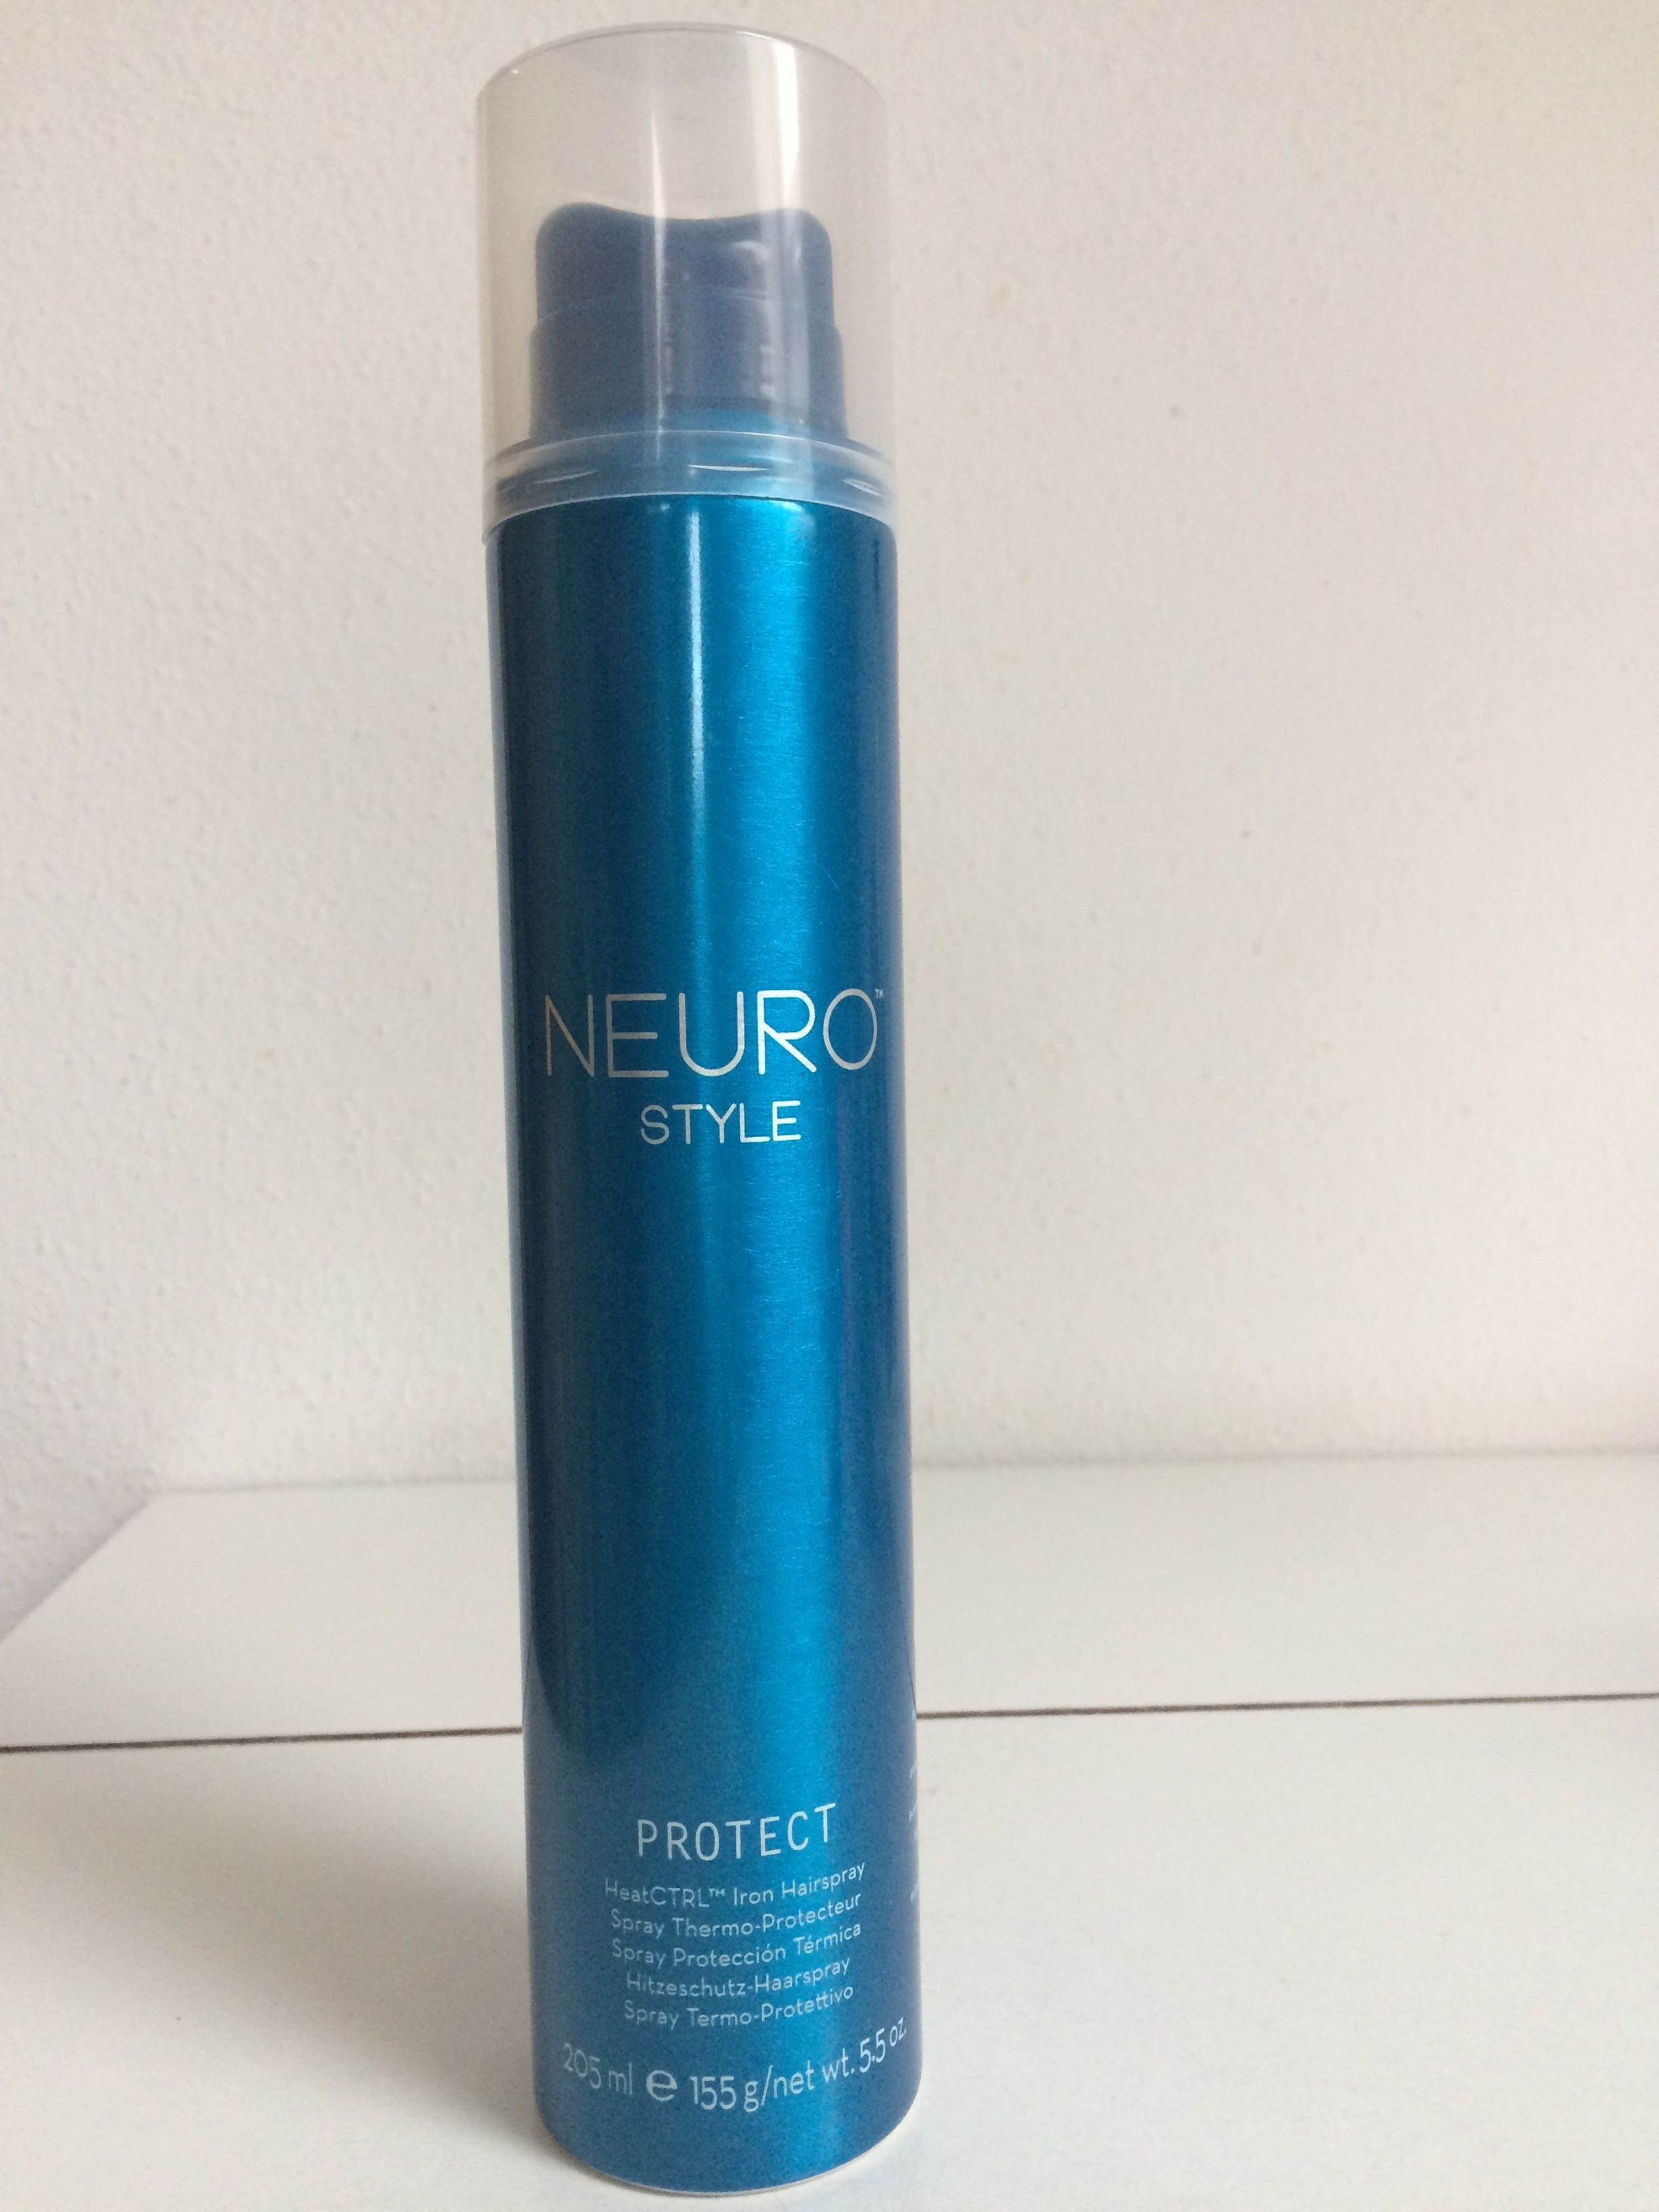 NEURO STYLE - Product - de